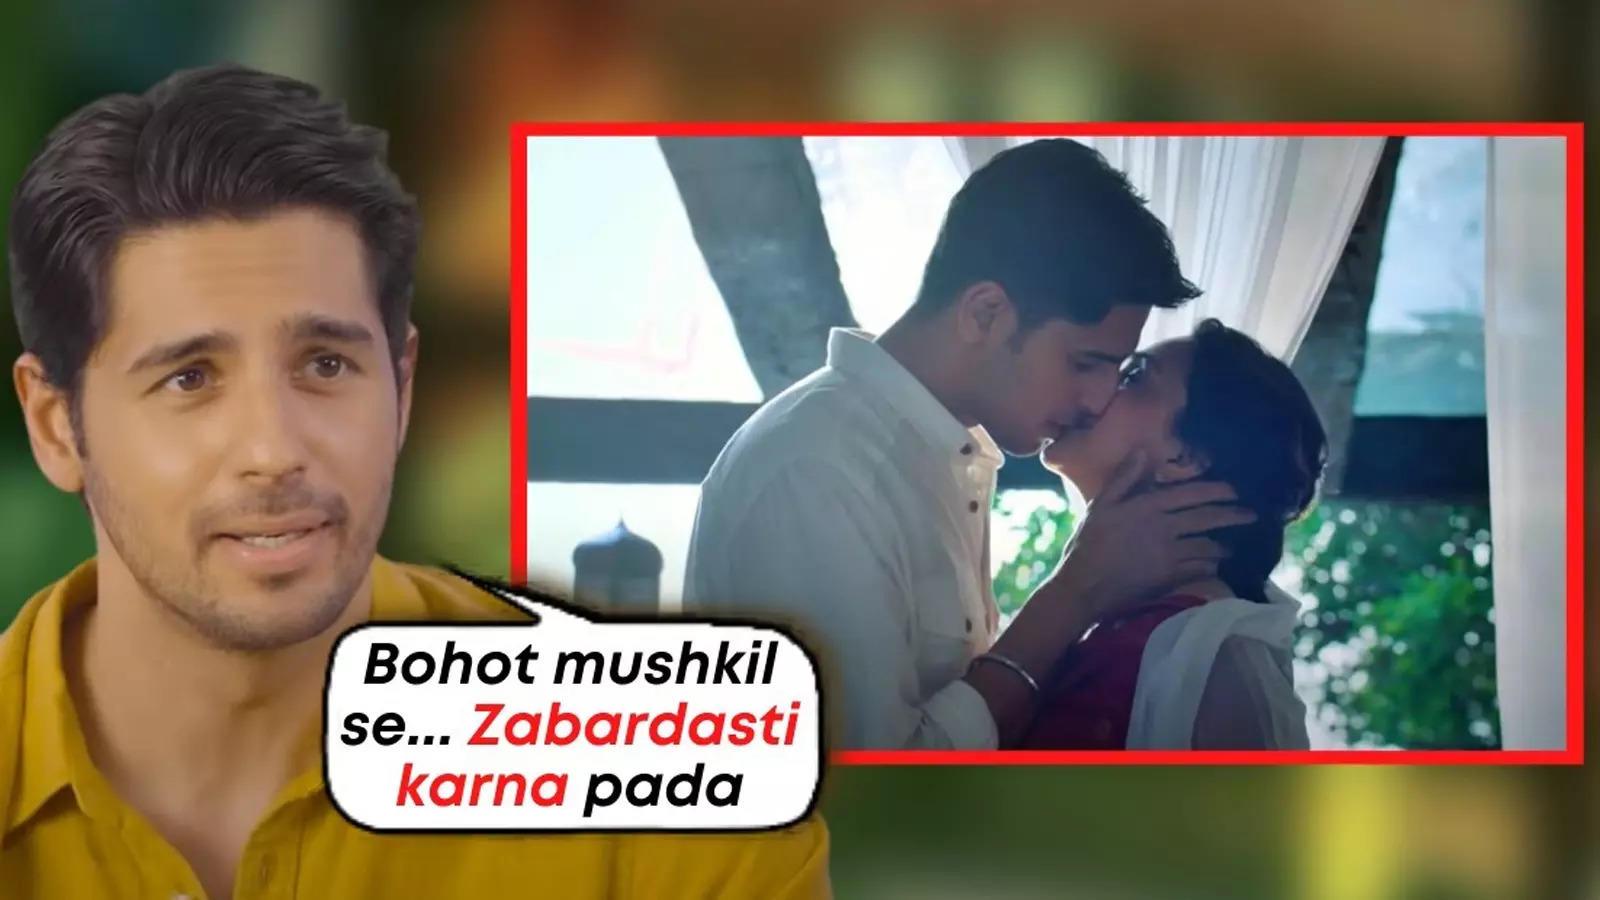 sidharth-malhotra-on-kissing-scene-with-kiara-advani-in-shershaah-zabardasti-karna-pada